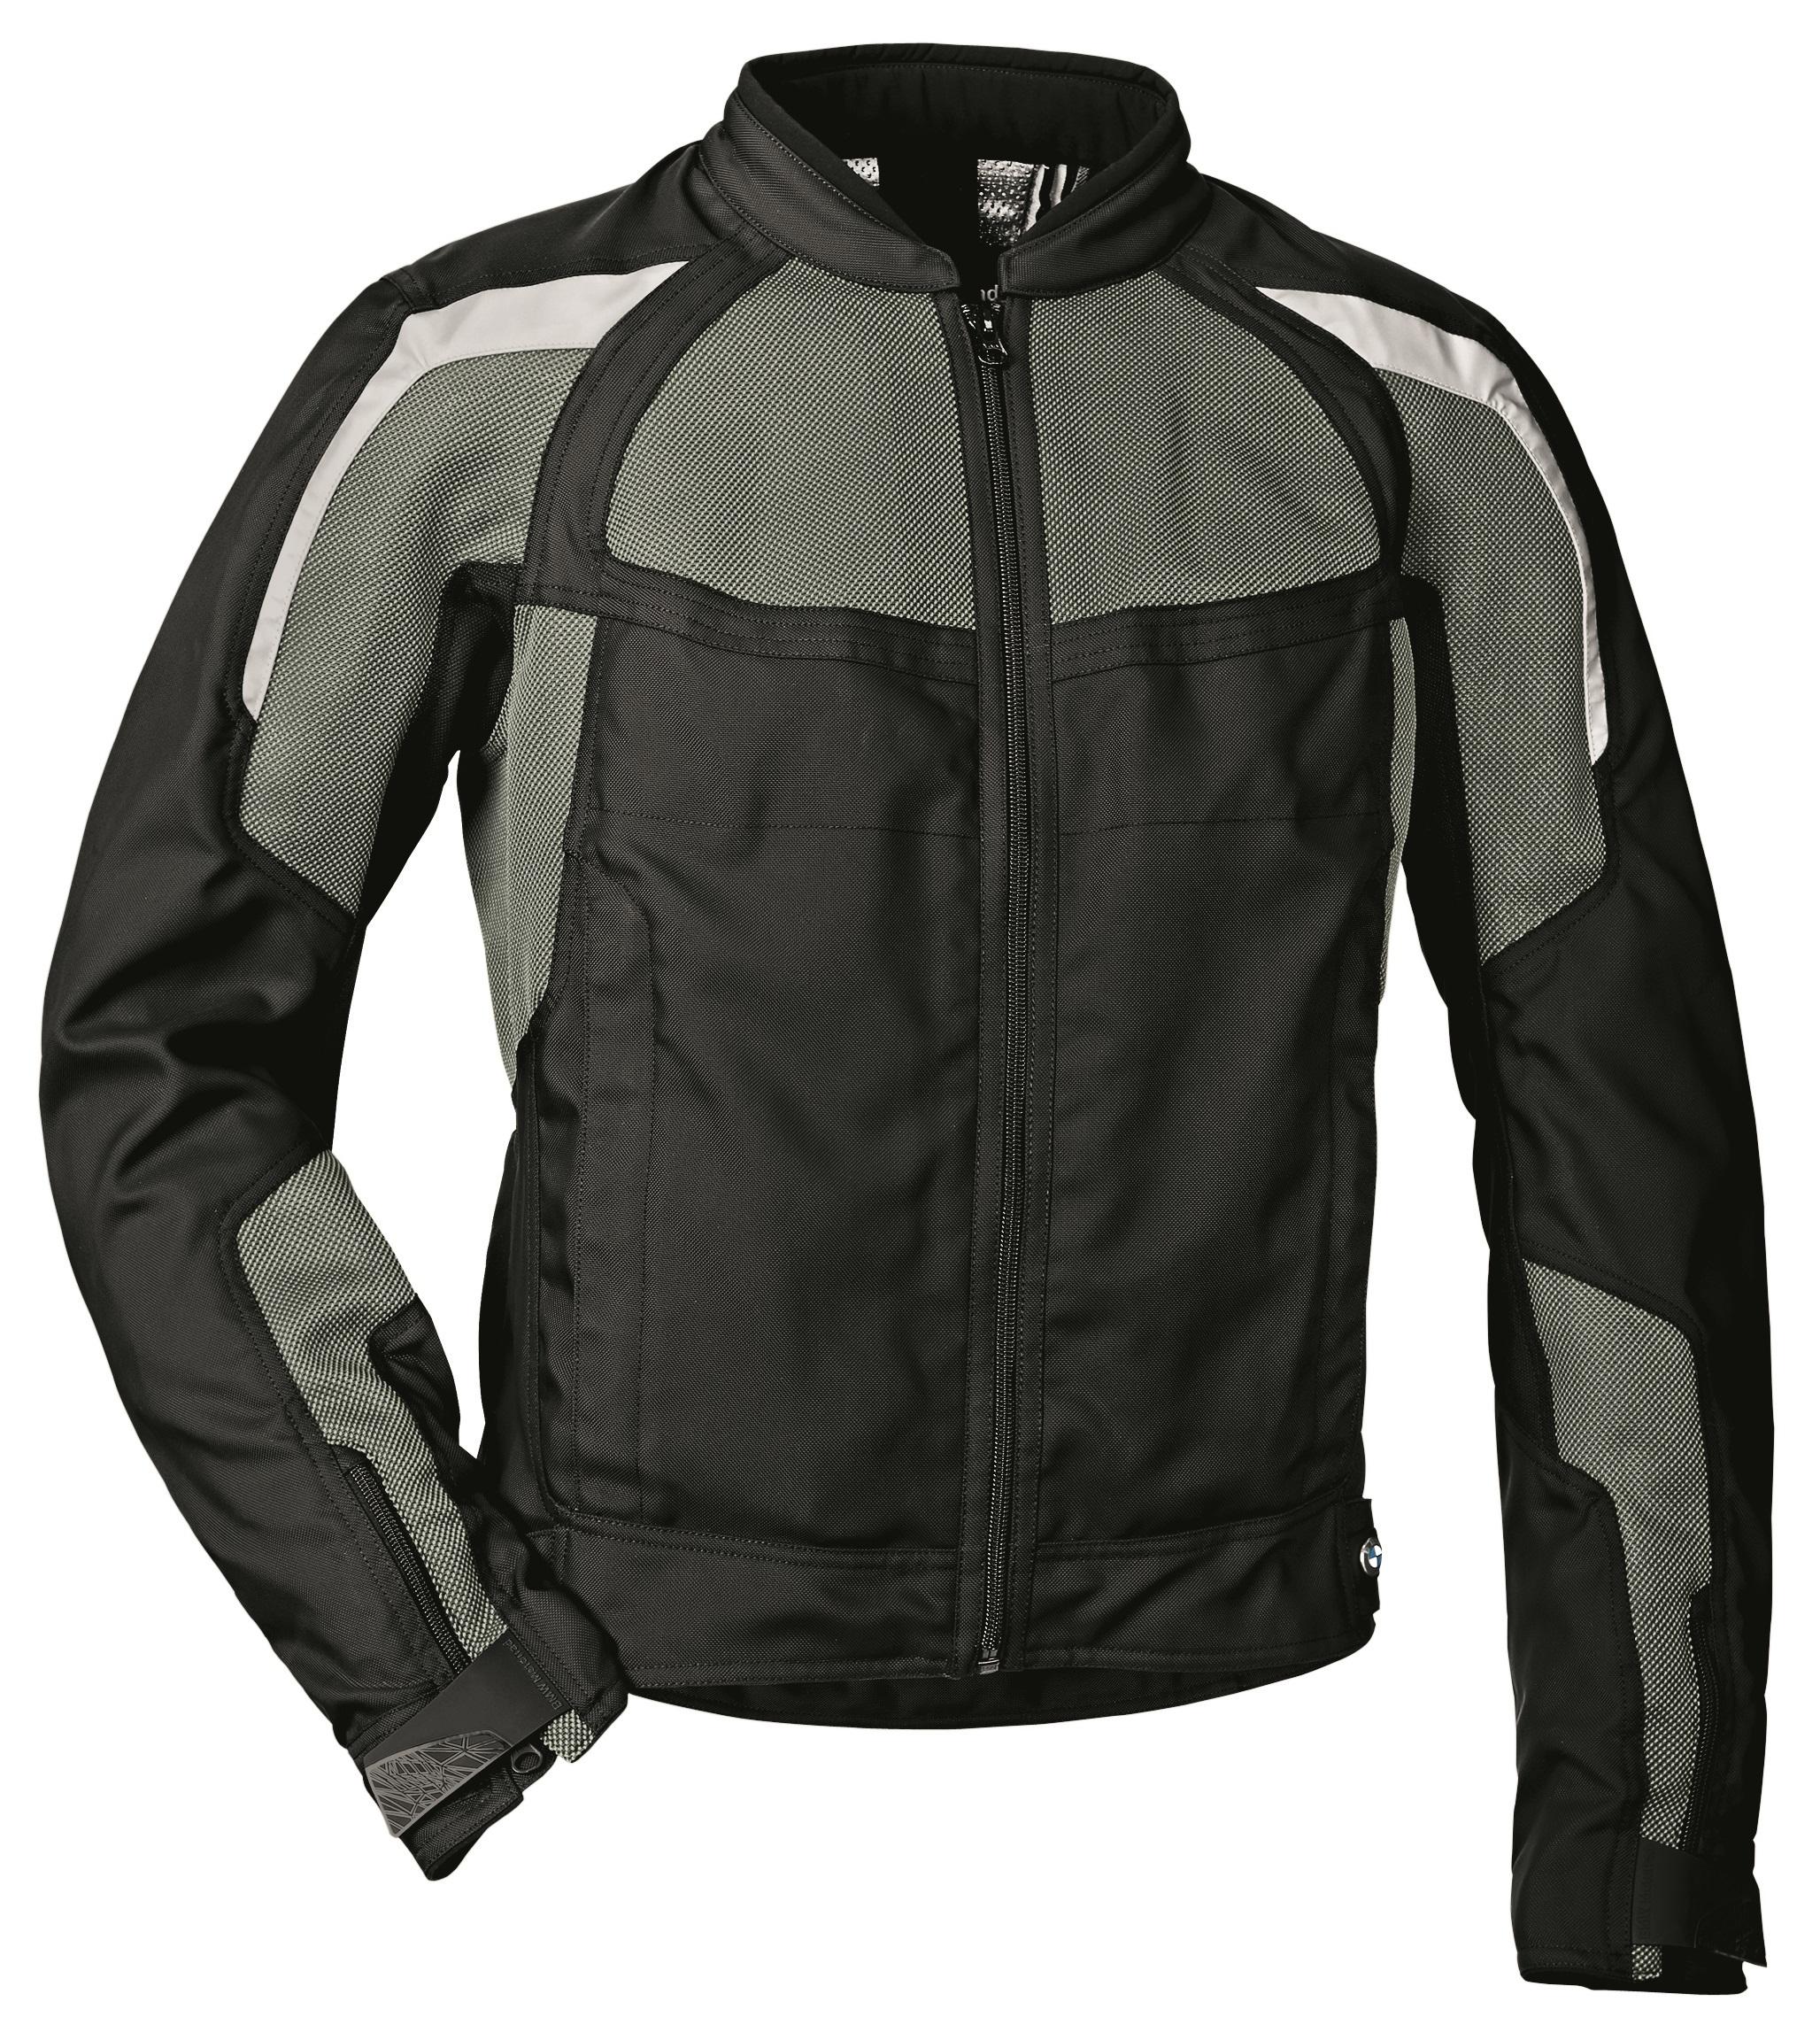 Bmw Airflow Jacket Revzilla